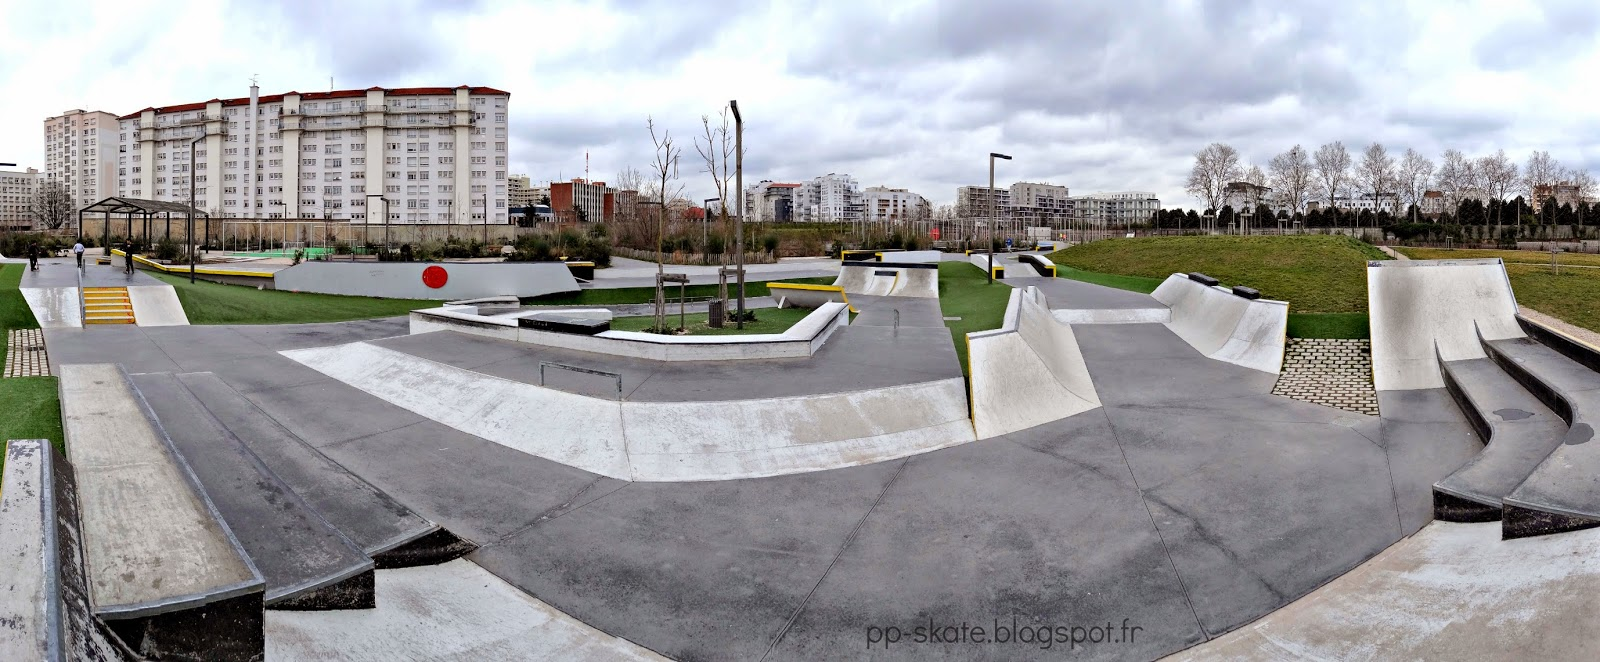 skatepark Lyon Blandan